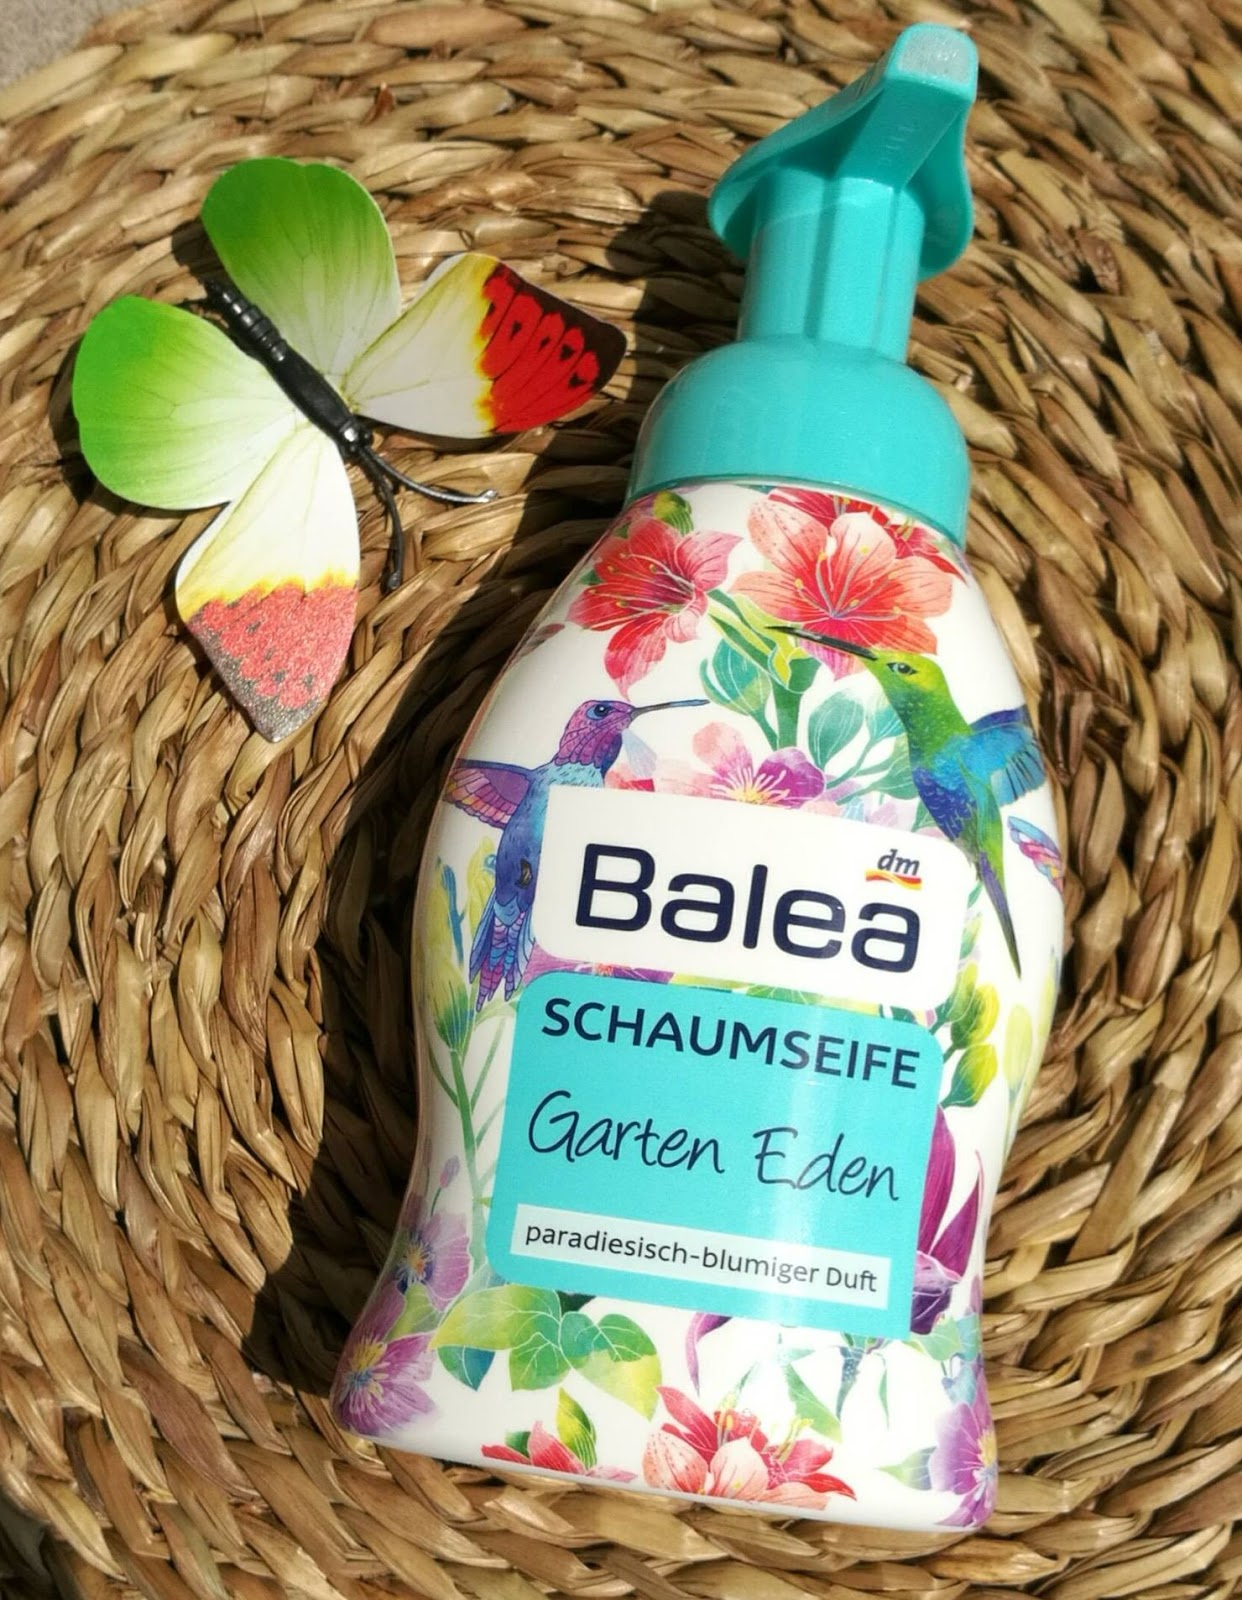 Miskasiska25 penov mydlo balea garten eden for Garten eden